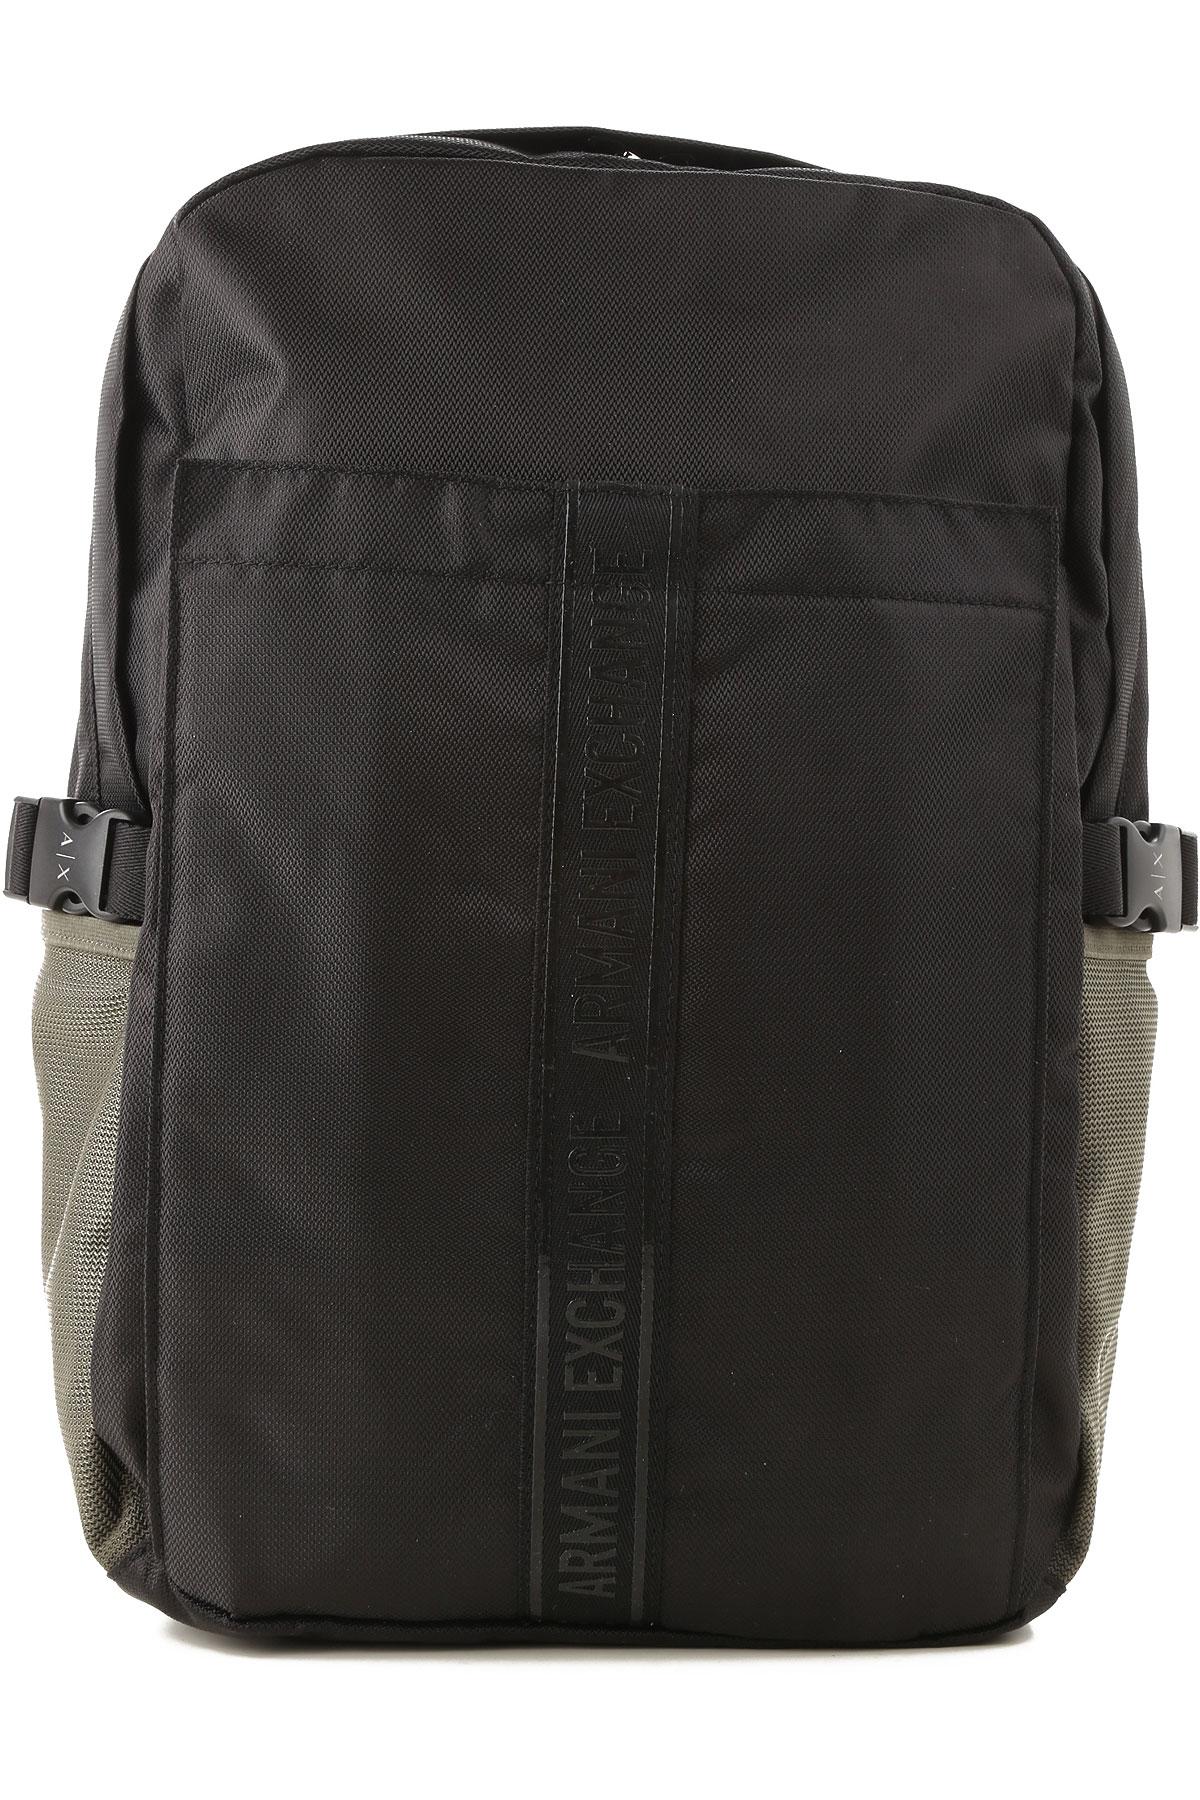 Image of Armani Jeans Backpack for Men, Black, polyester, 2017